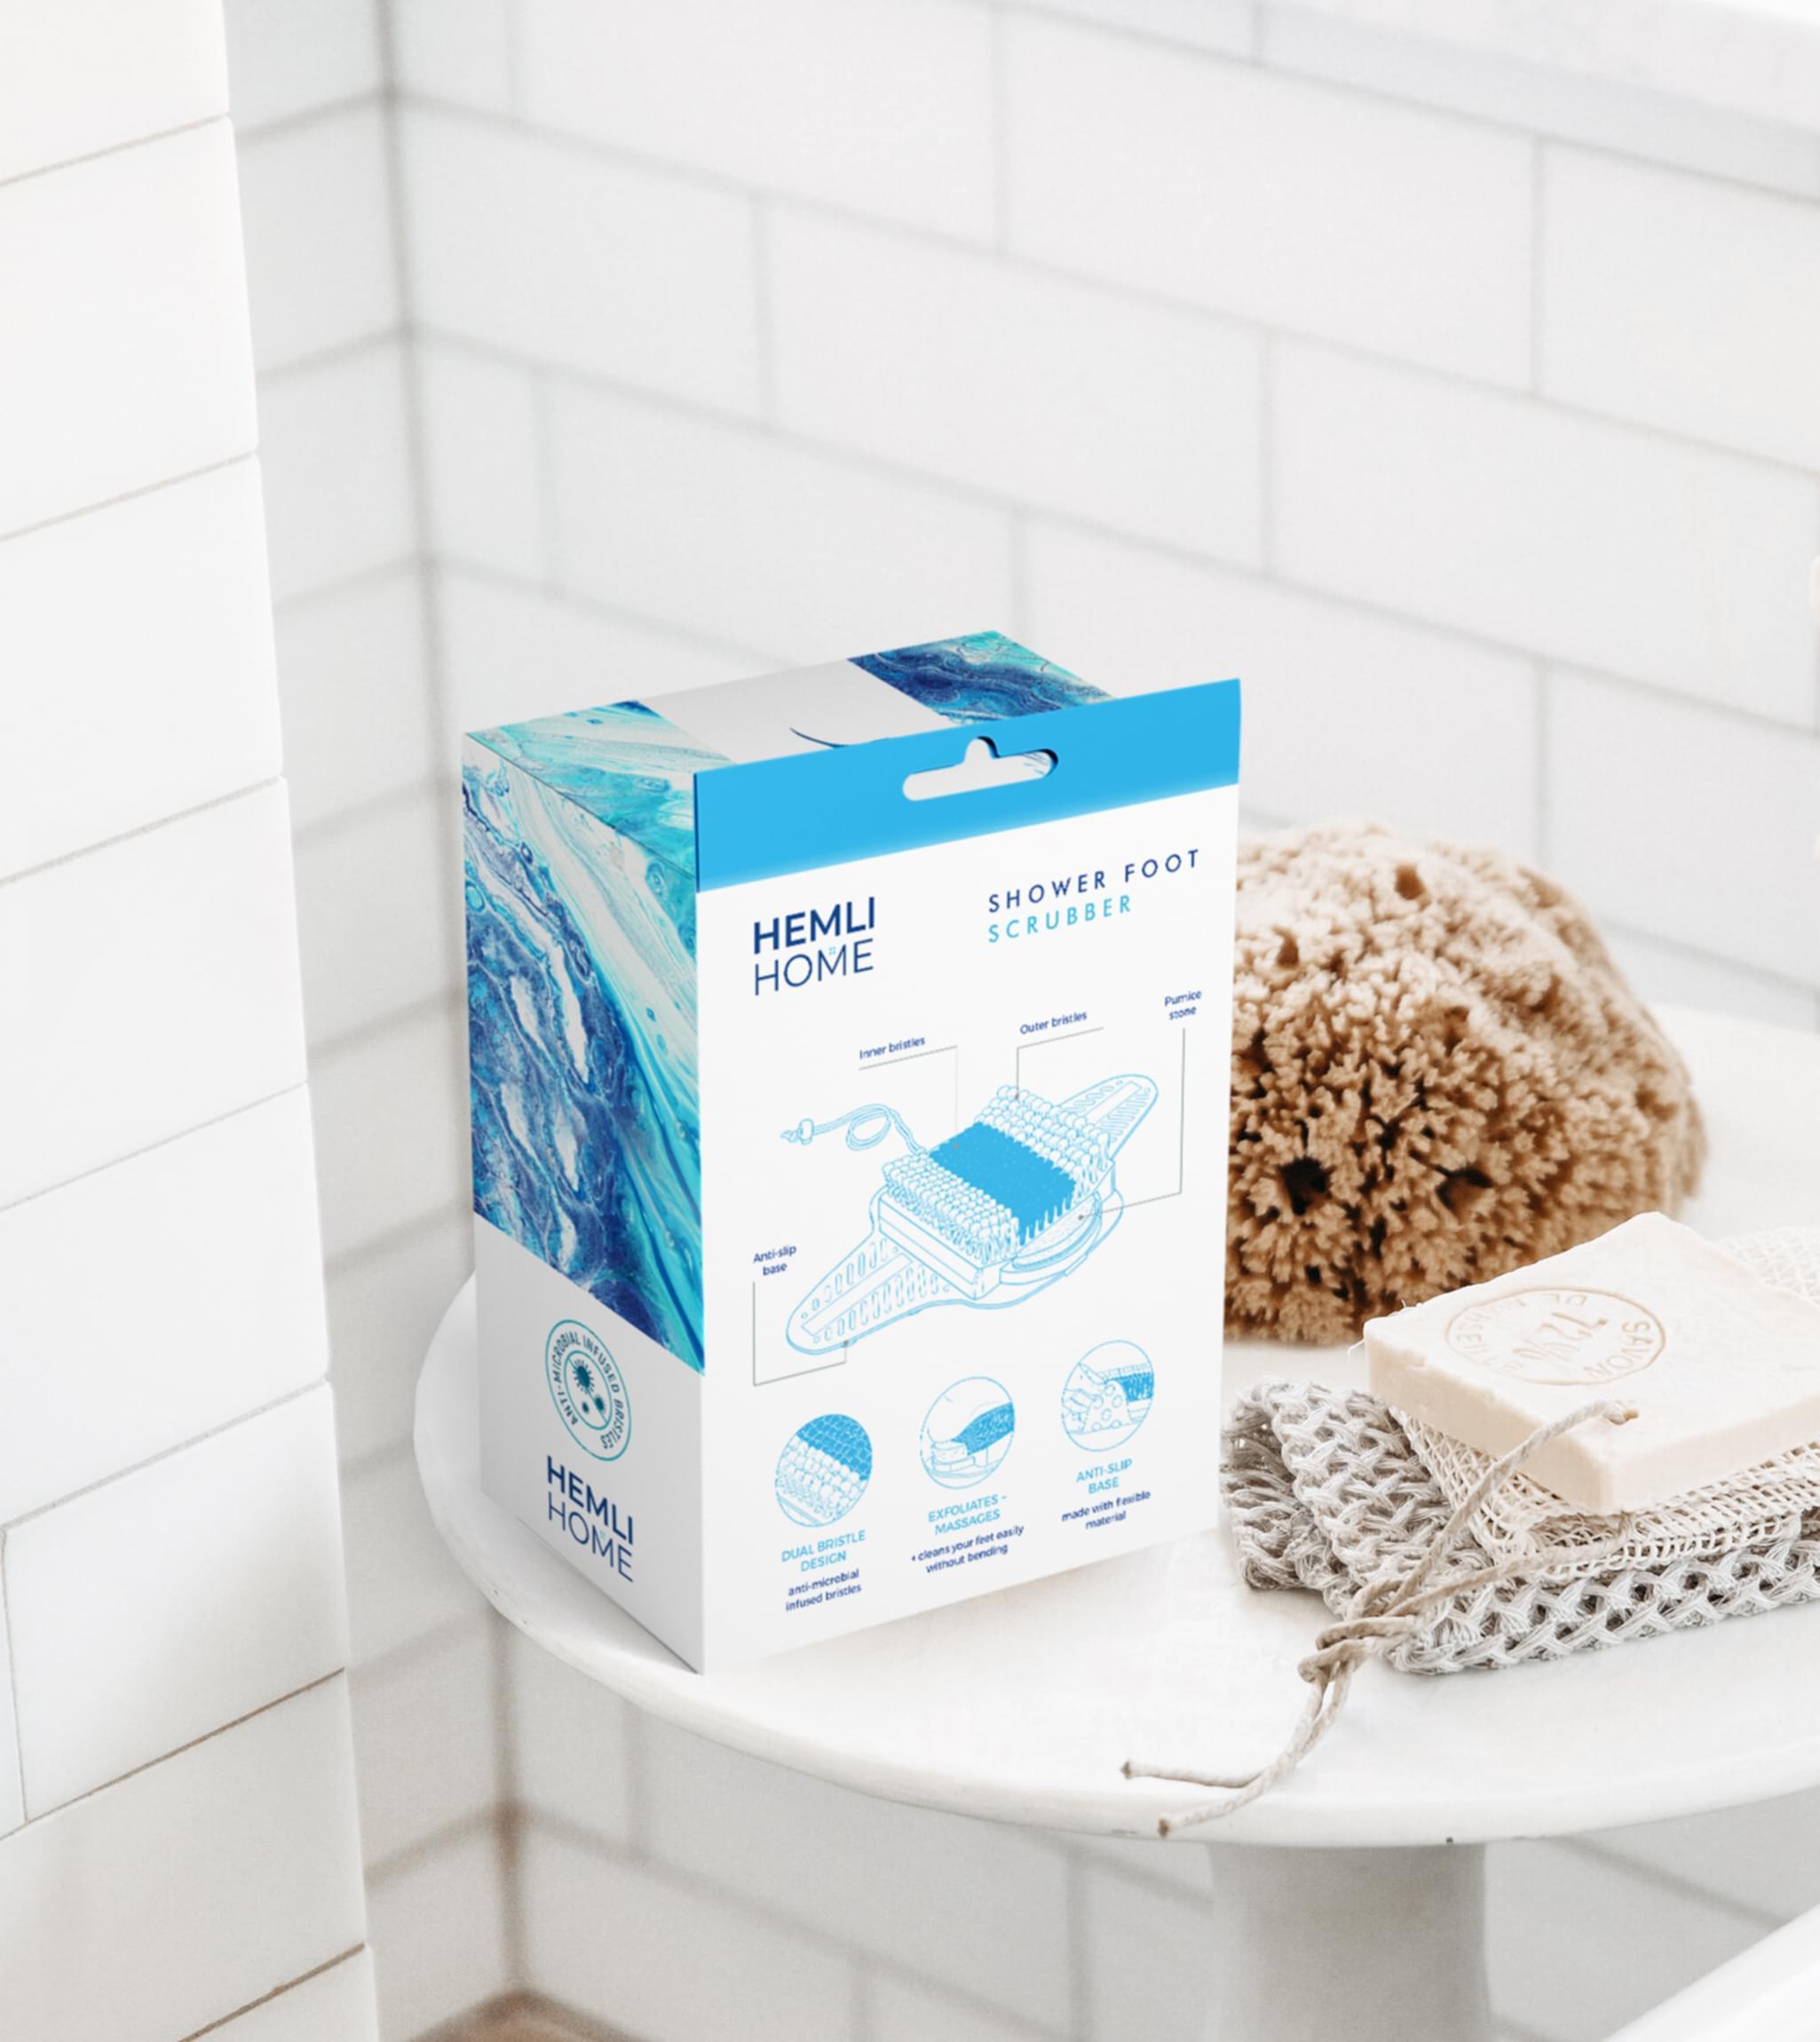 HEMLI HOME Packaging